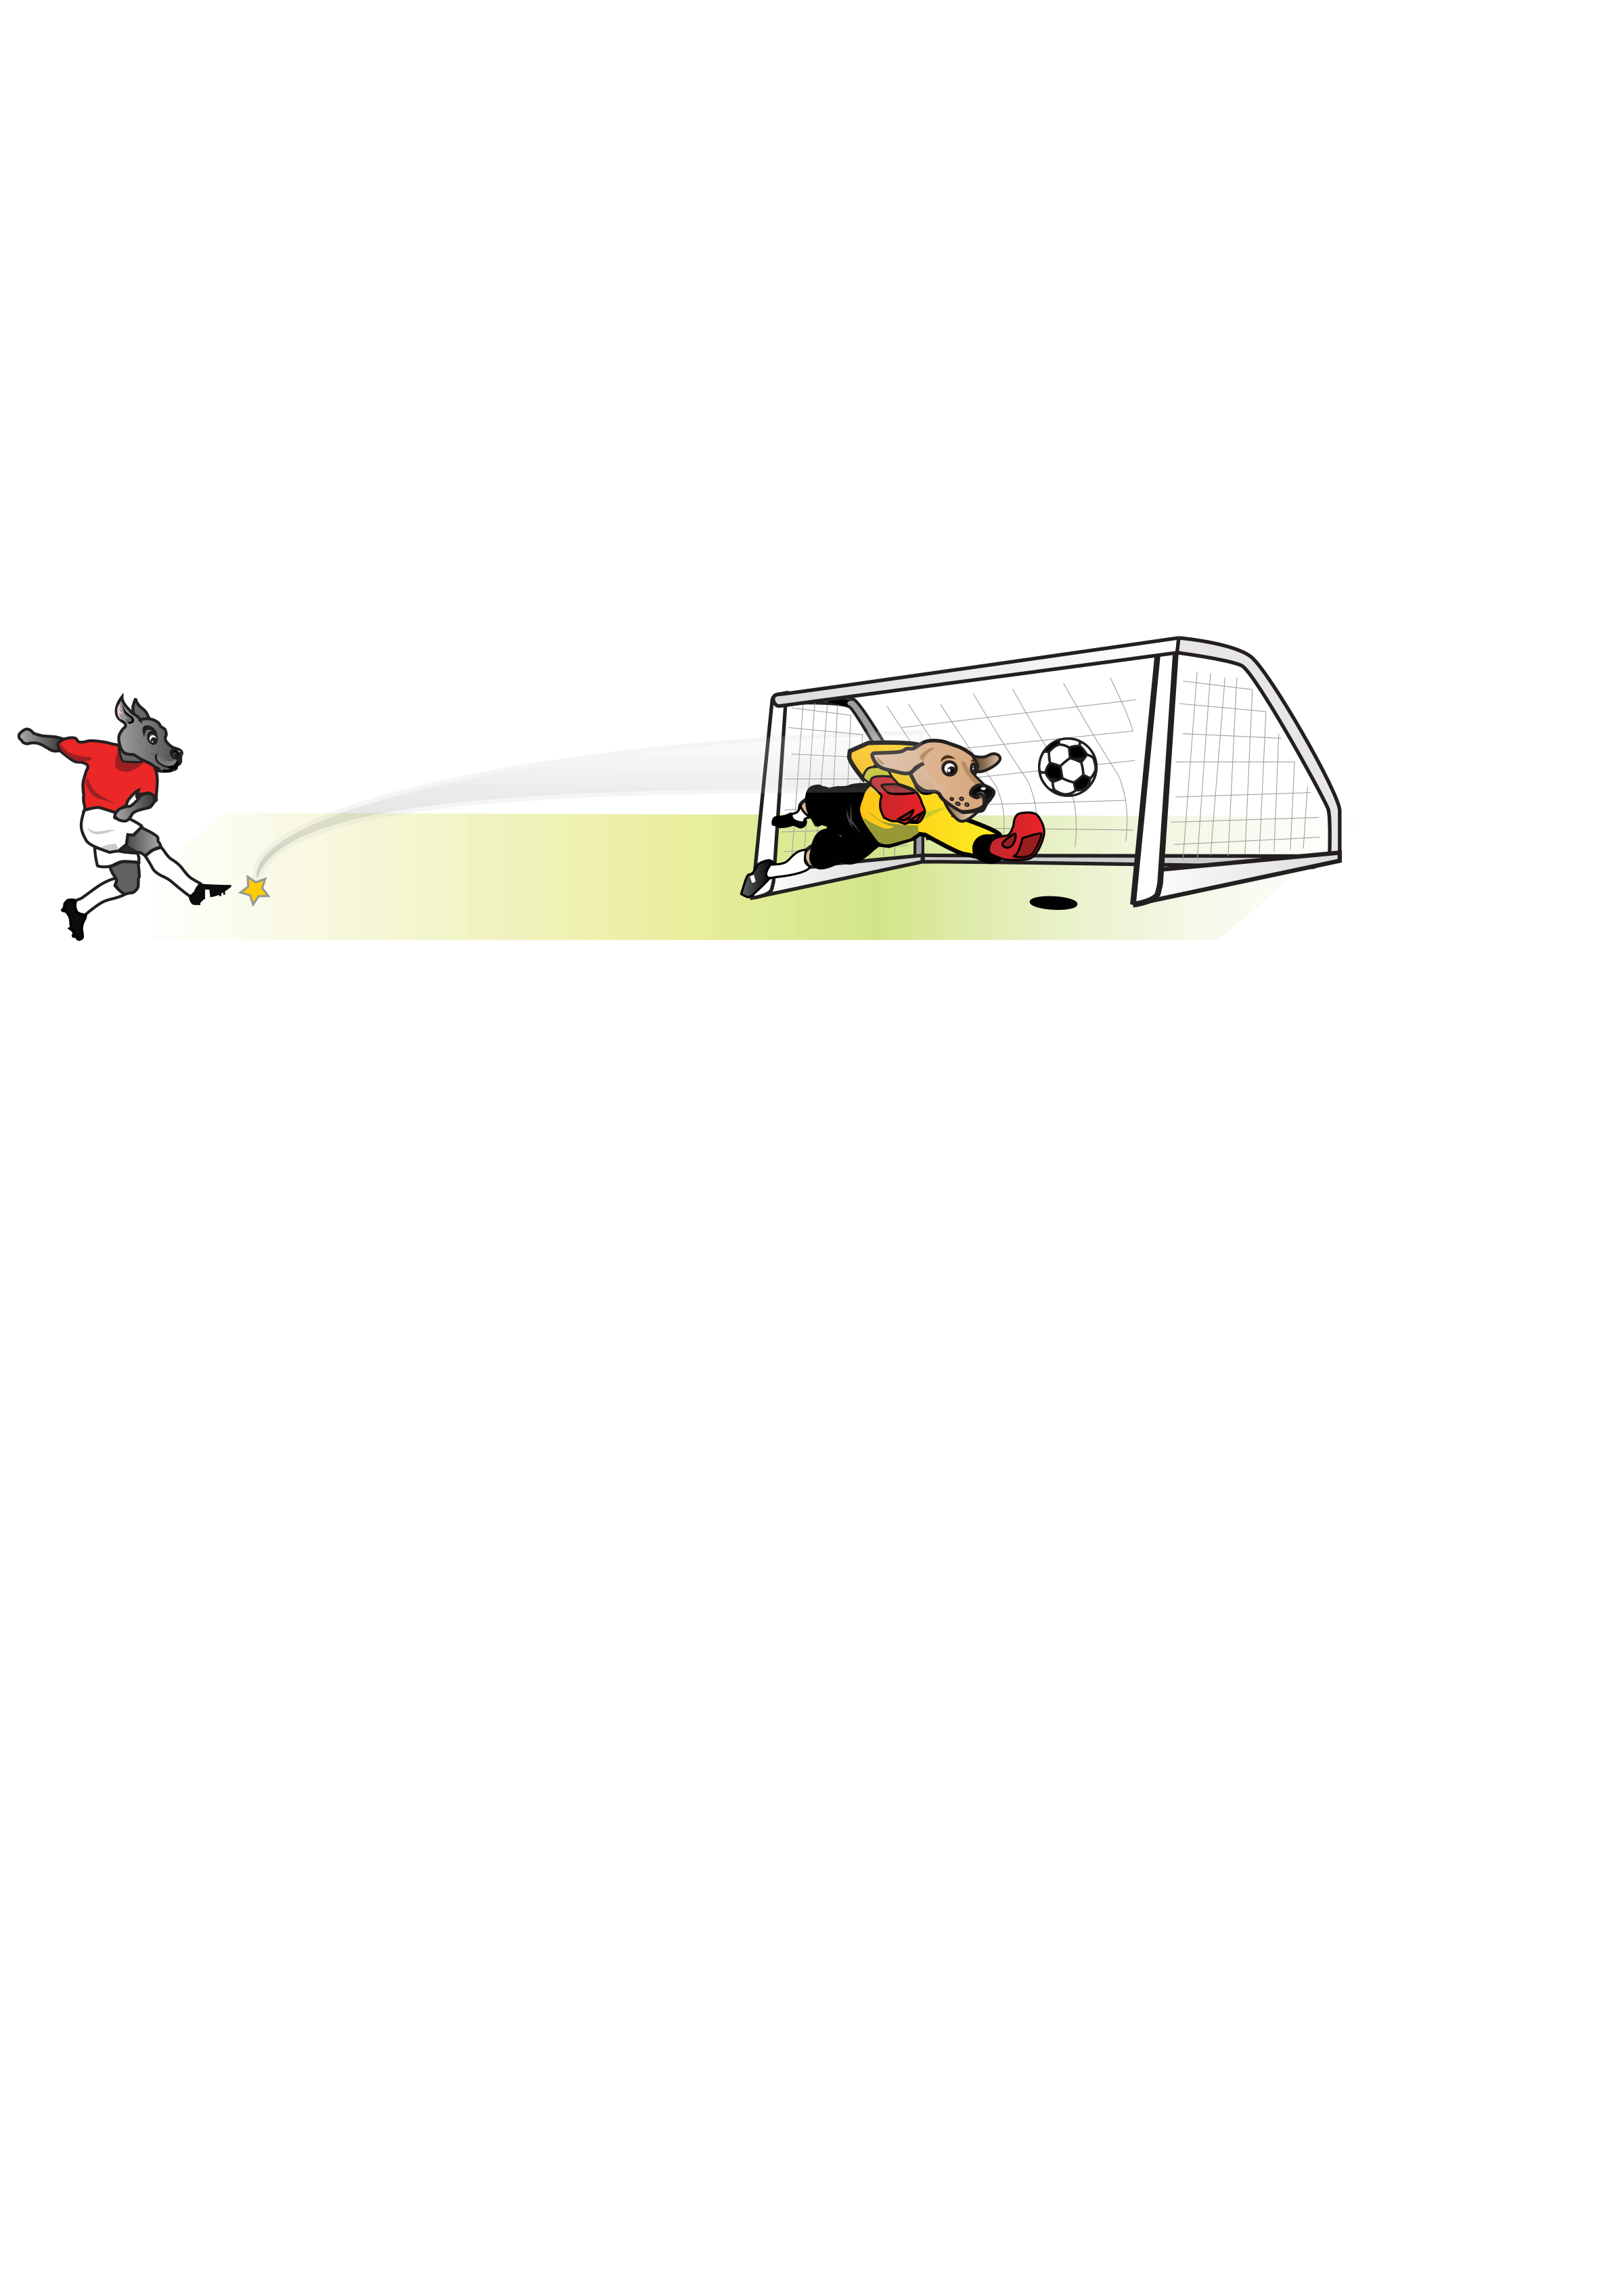 Goals clipart medium. Soccer dog striker kicking